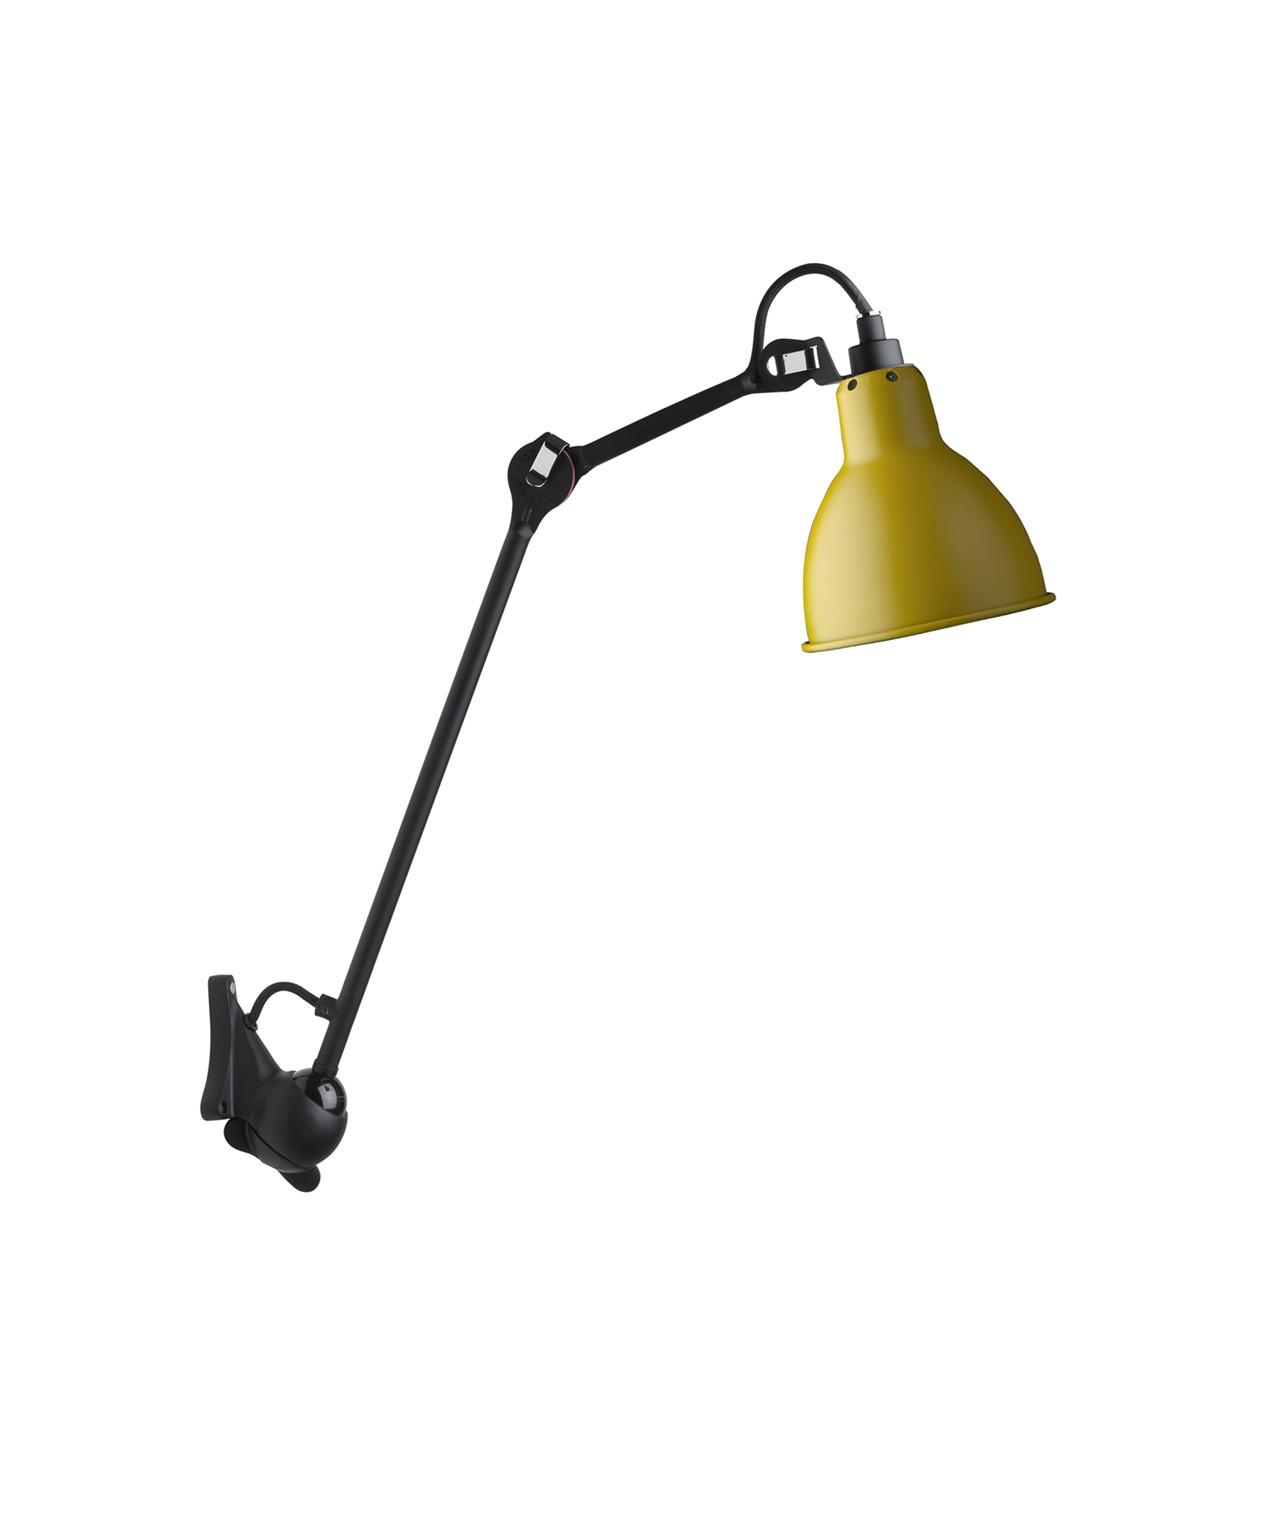 222 vegglampe gul svart lampe gras. Black Bedroom Furniture Sets. Home Design Ideas